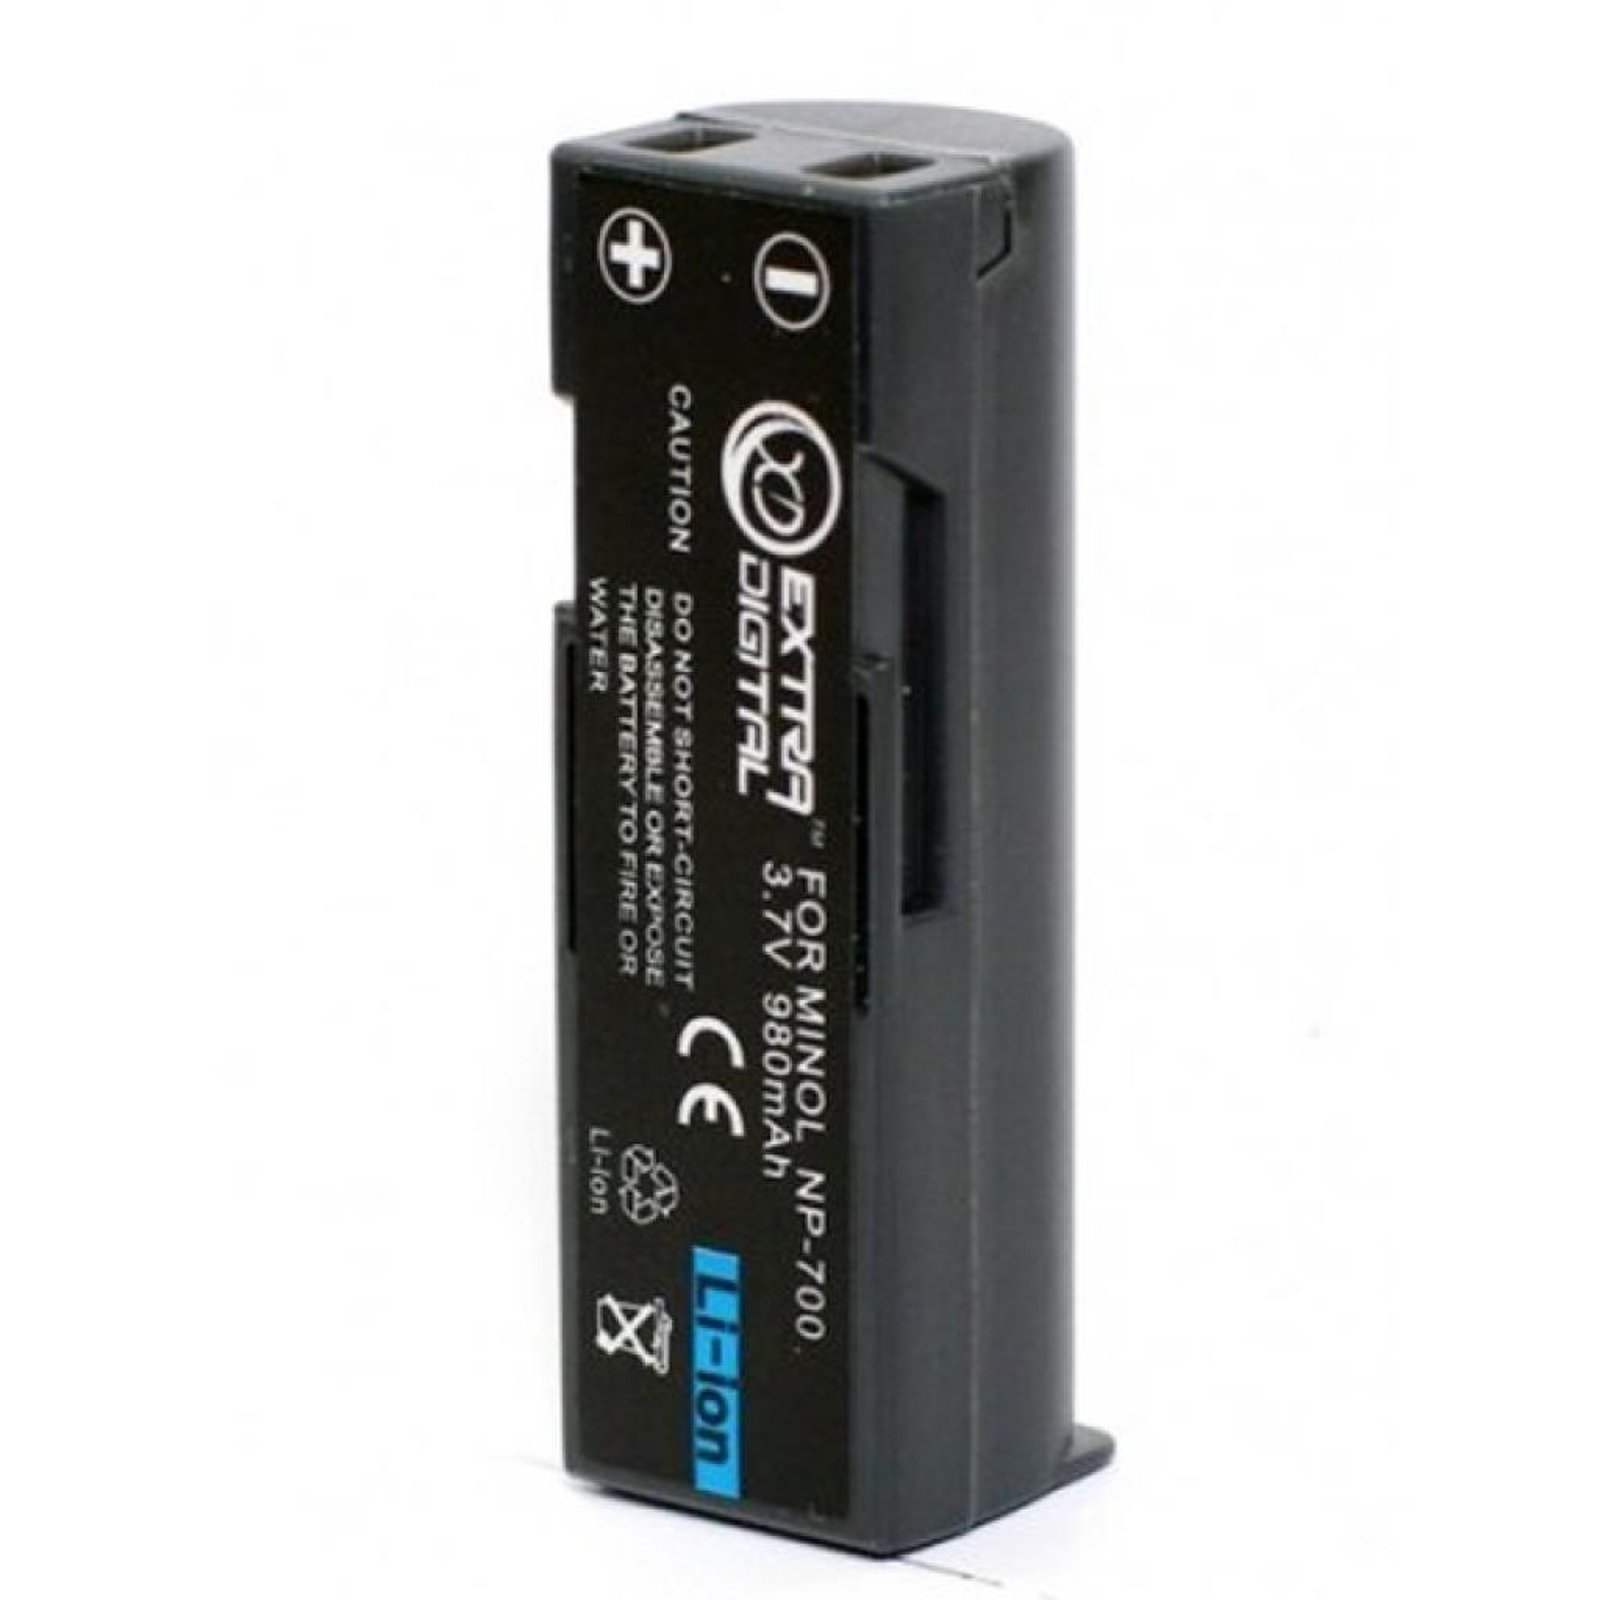 Аккумулятор к фото/видео EXTRADIGITAL Minolta NP-700, SLB-0637, DB-L30, D-LI72 (DV00DV1055) изображение 2